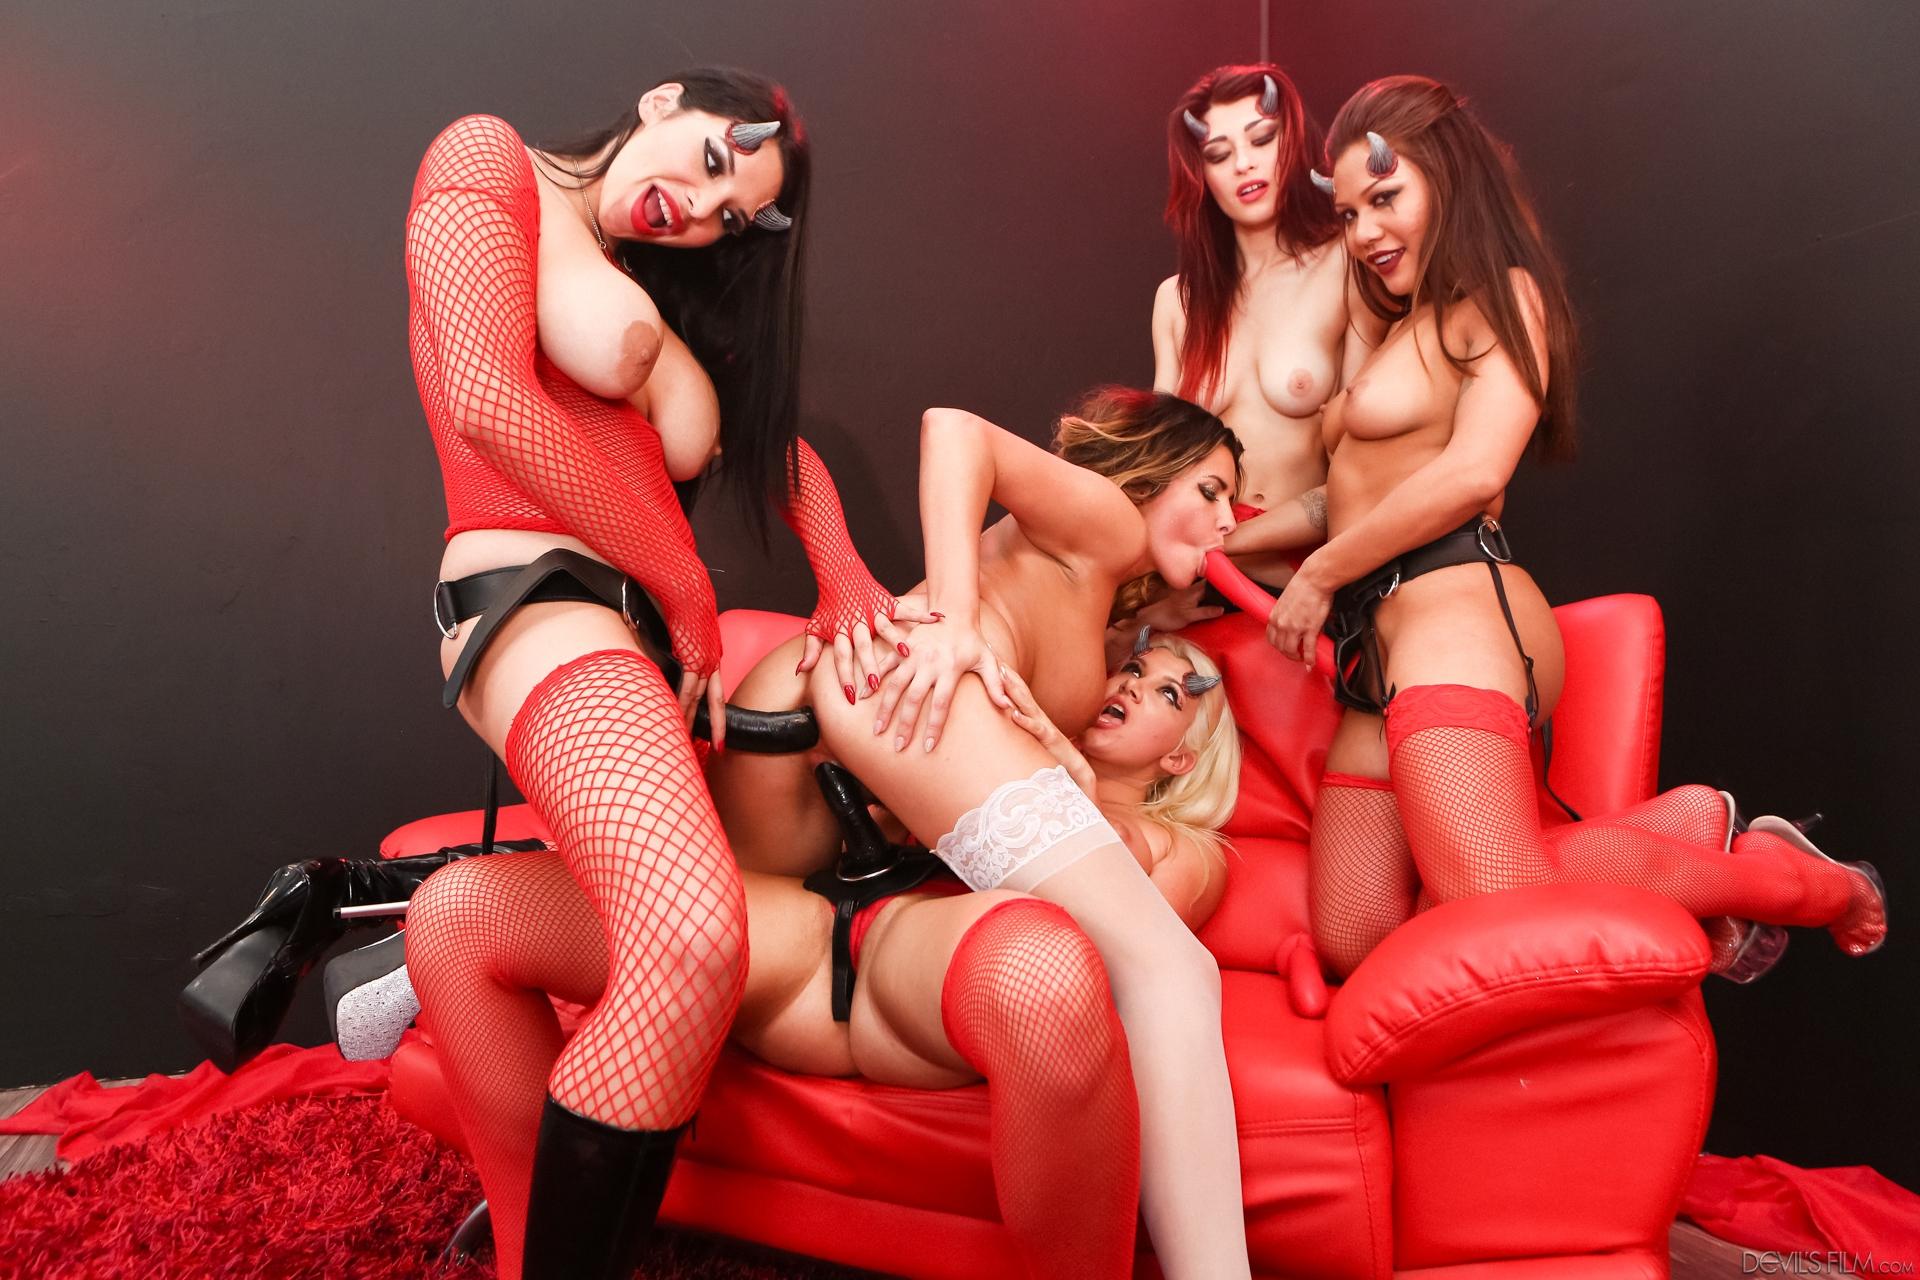 lesbian orgy anal Orgy Long Sex Tubes - Hot Hq Tube Movies.